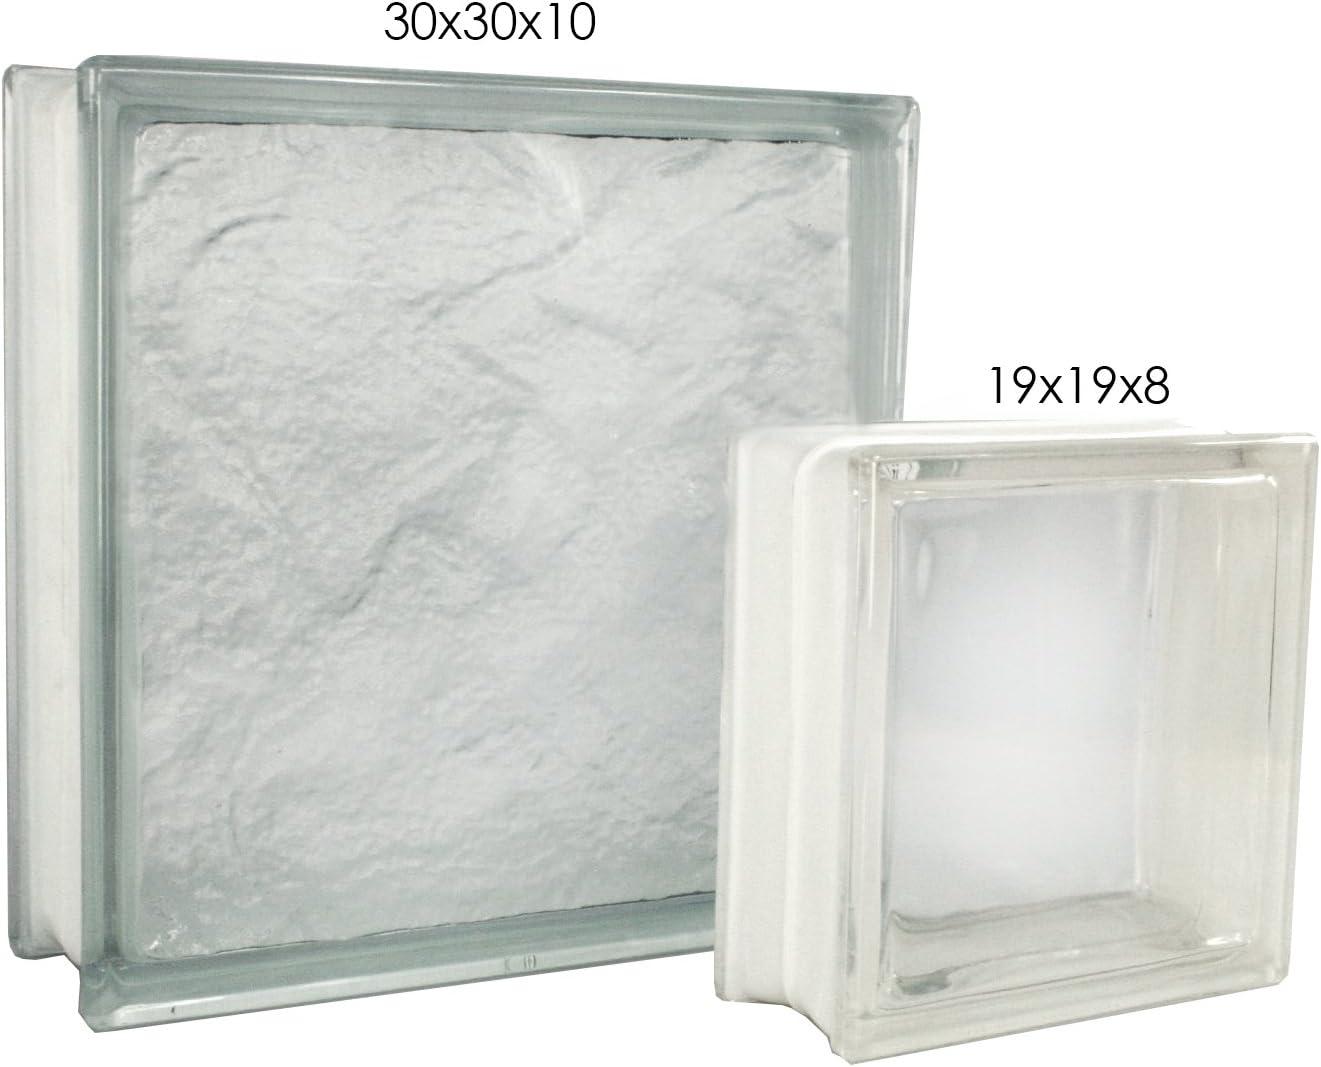 2 piezas FUCHS bloques de vidrio vista completa neutro 30x30x10 cm